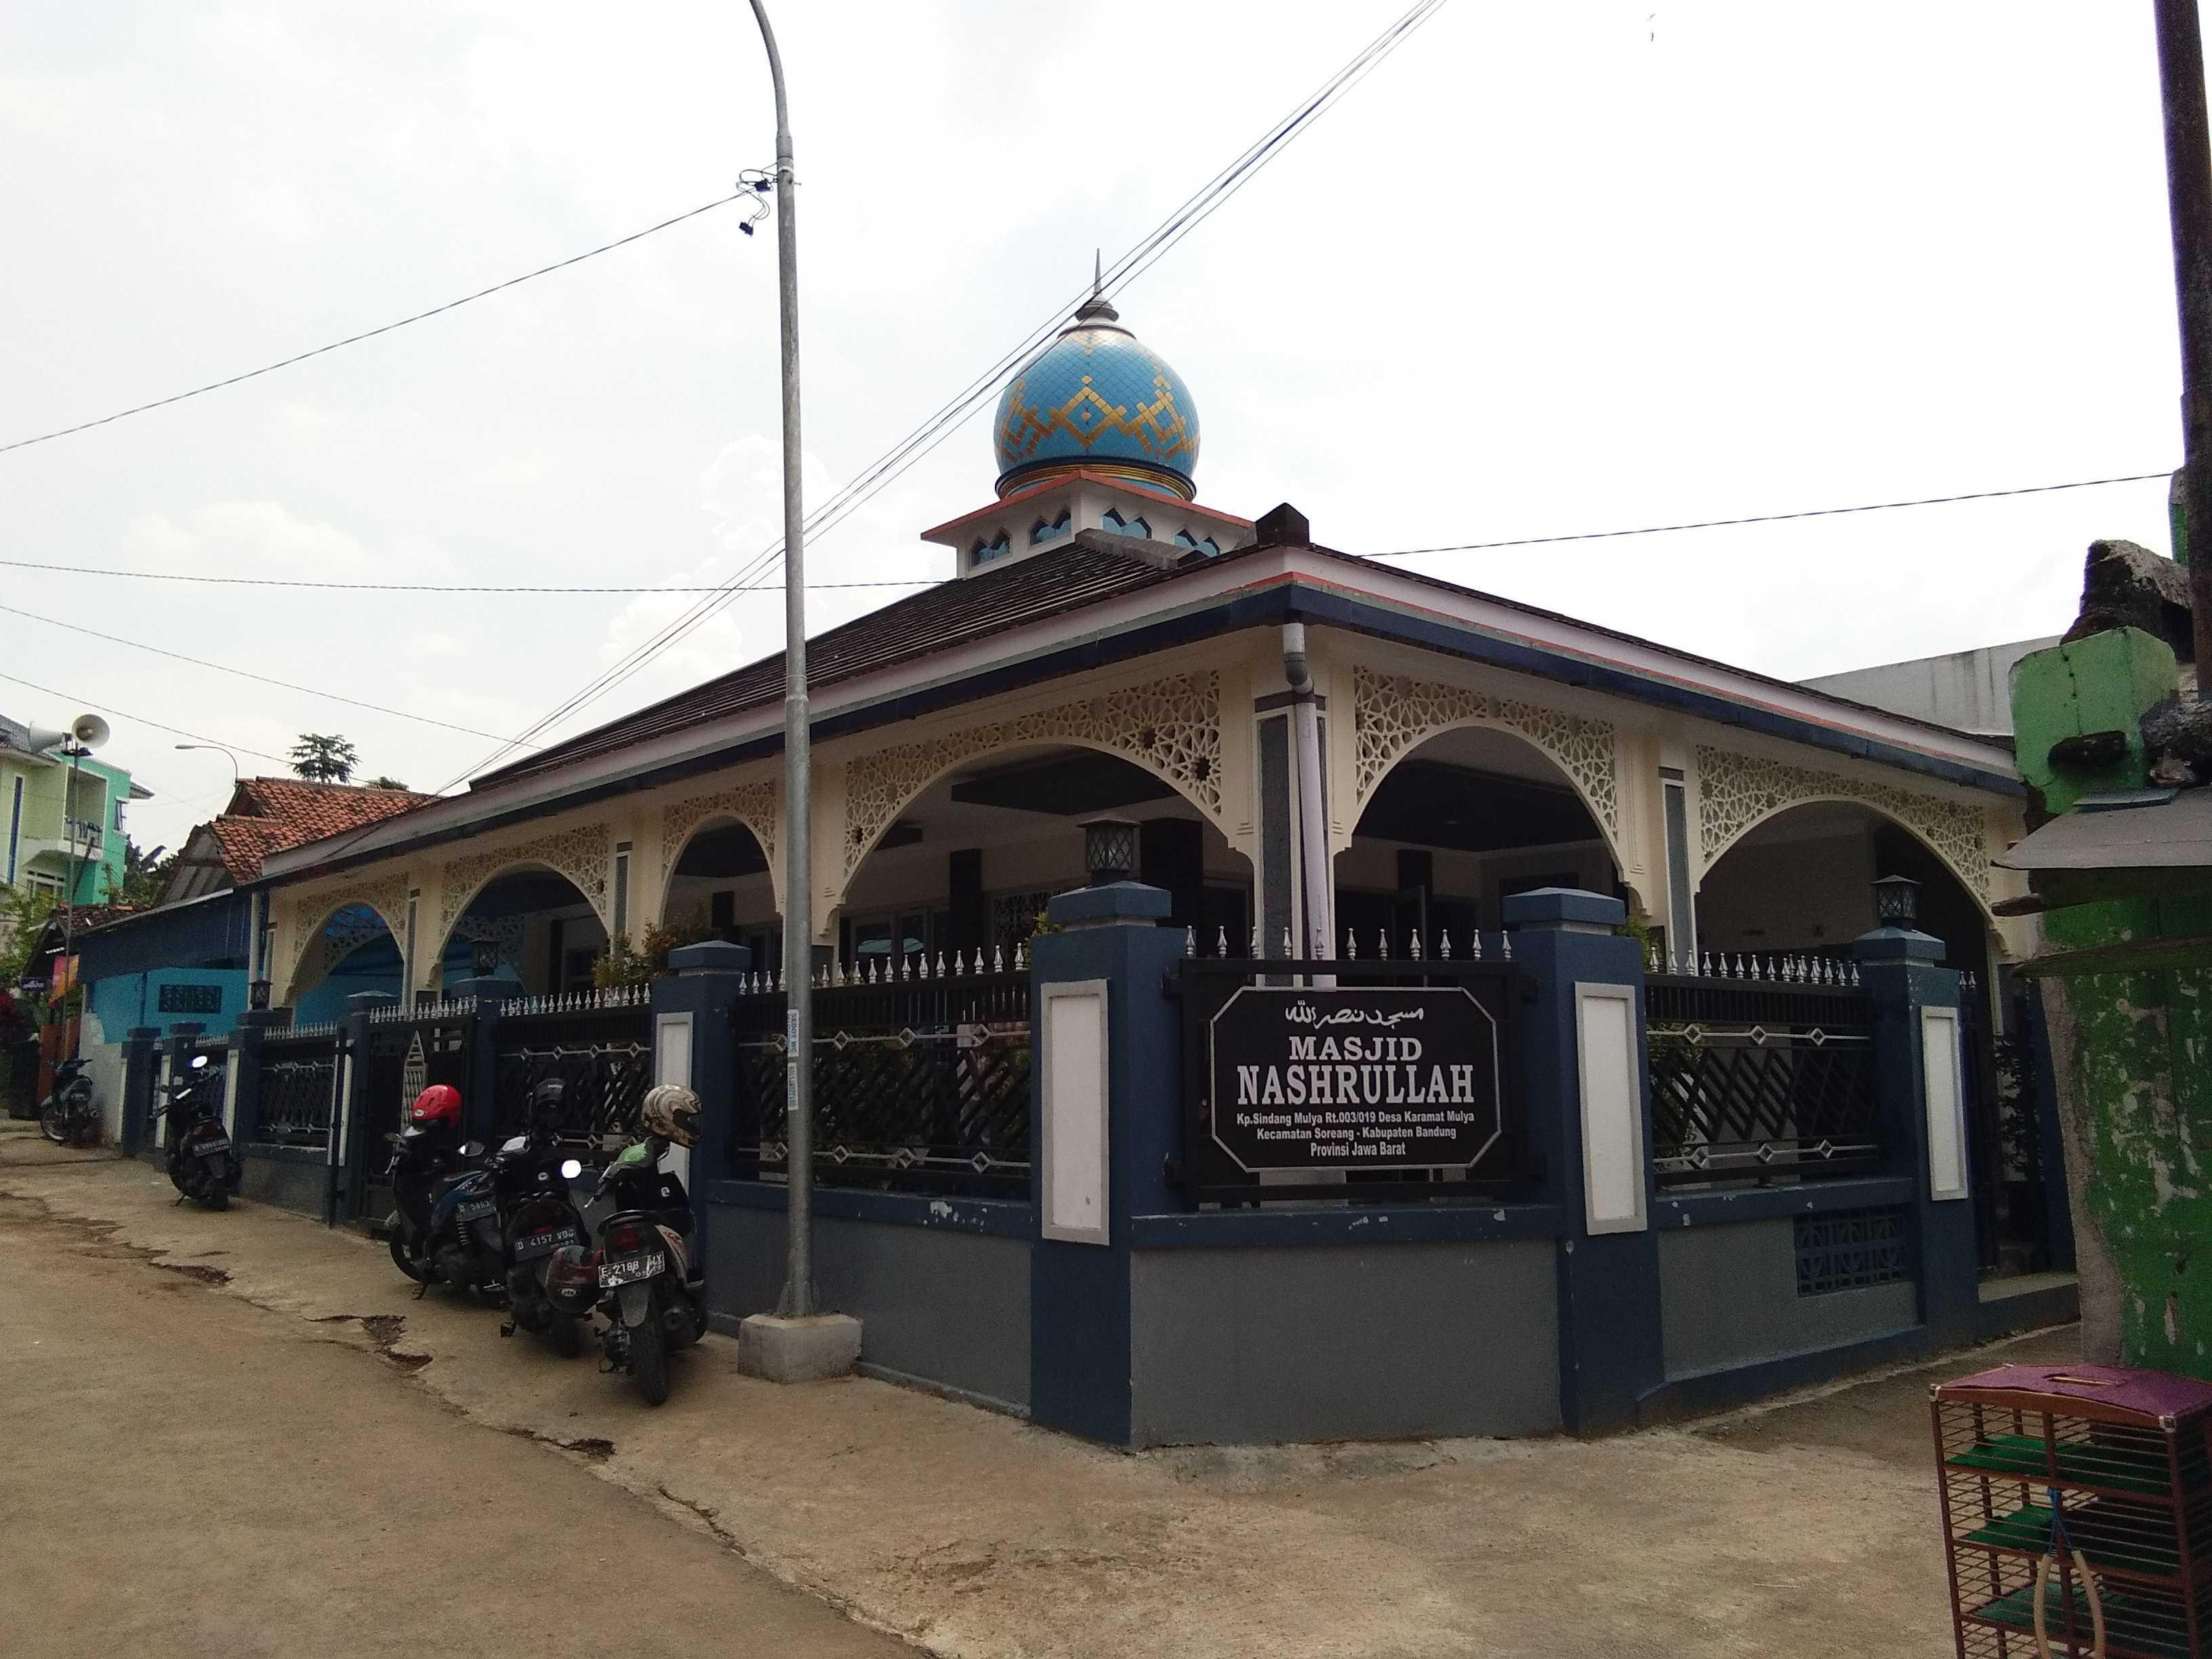 Archdesignbuild7 Mesjid Nasrullah  Soreang, West Java Soreang, West Java Andiyanto-Purwonost-Mesjid-Nasrullah-   57339